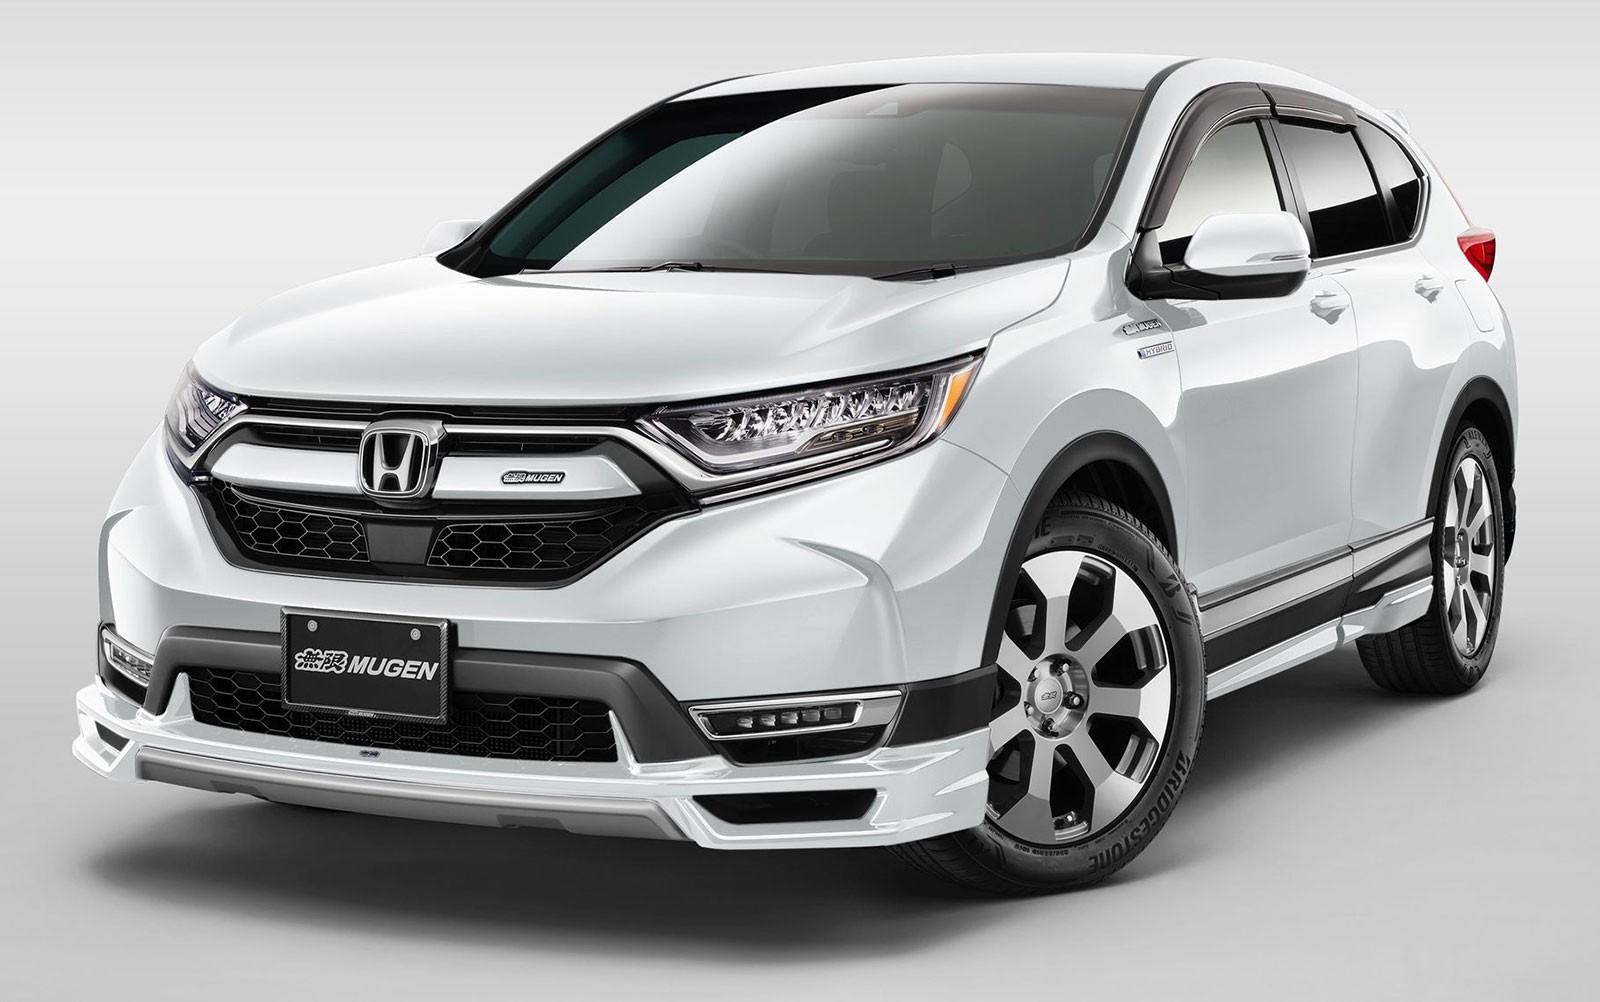 Honda CR-V Mugen 2019 sắp ra mắt trong triển lãm Tokyo Auto Salon 2019